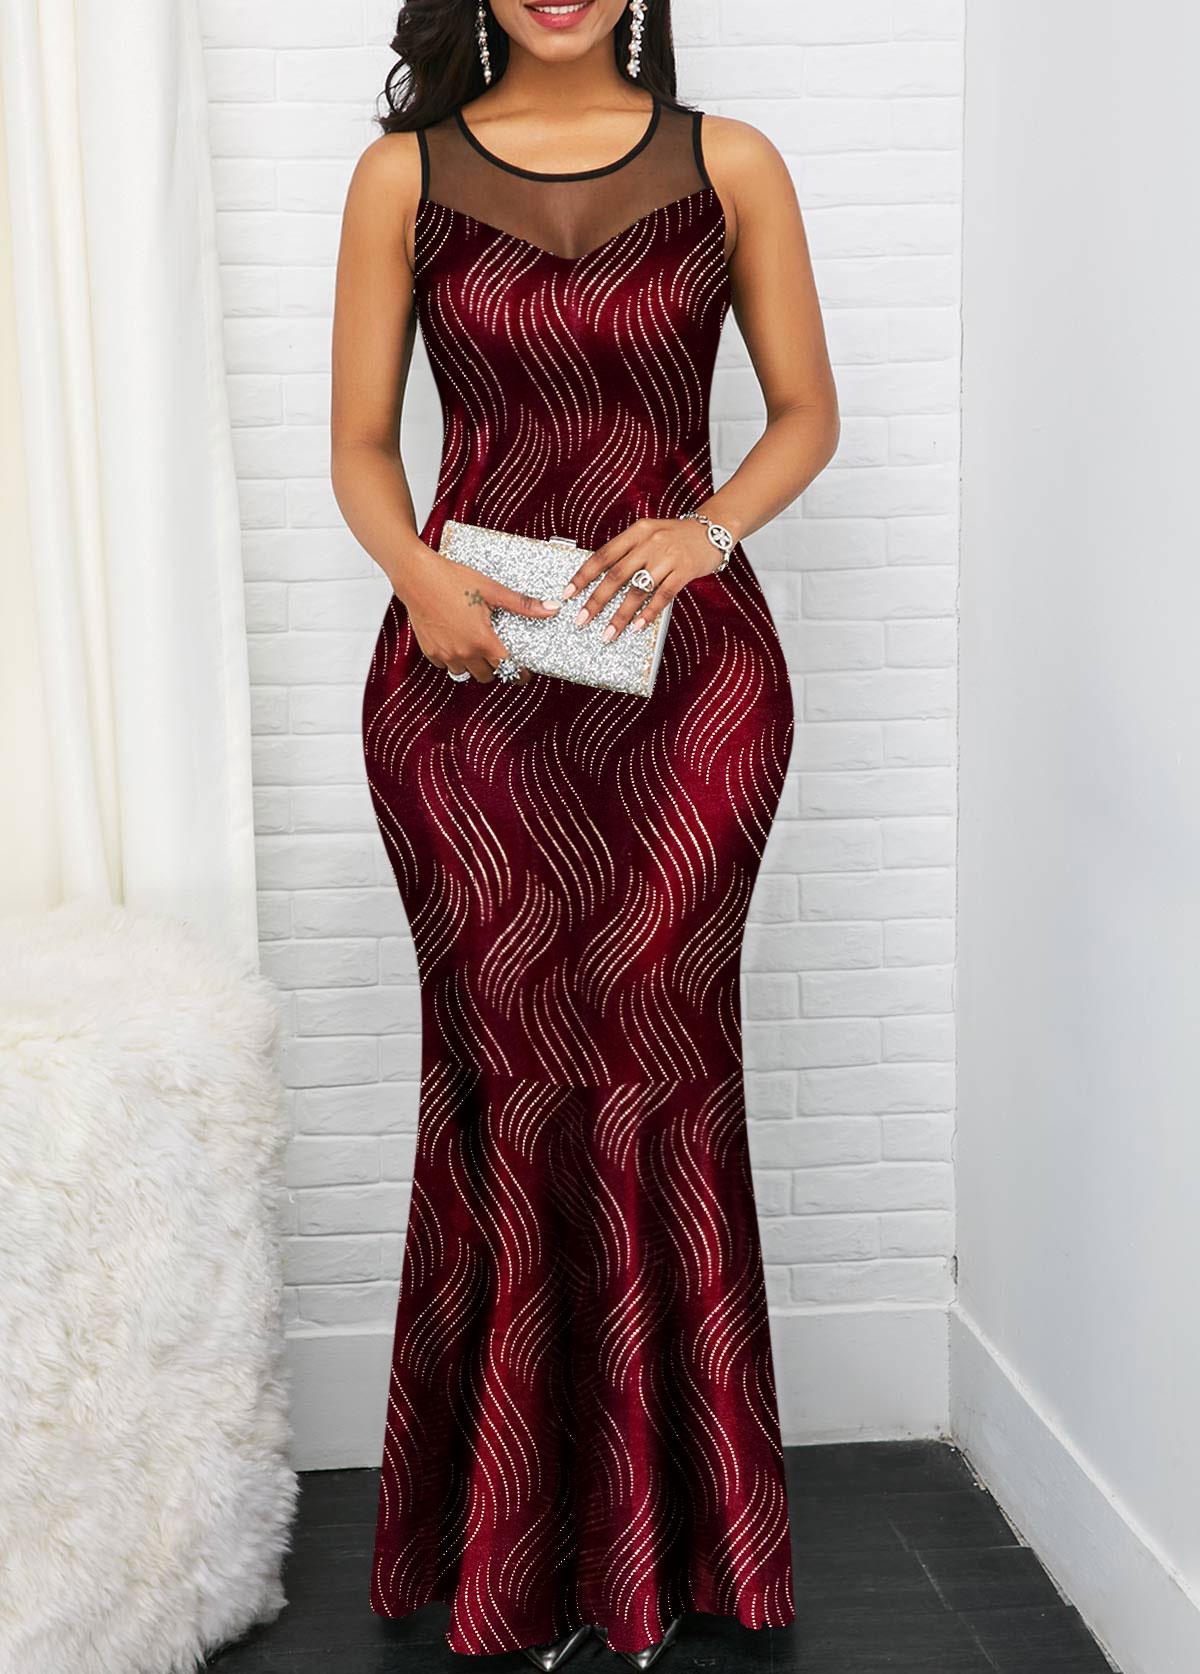 Mesh Panel Sleeveless Hot Stamping Maxi Dress